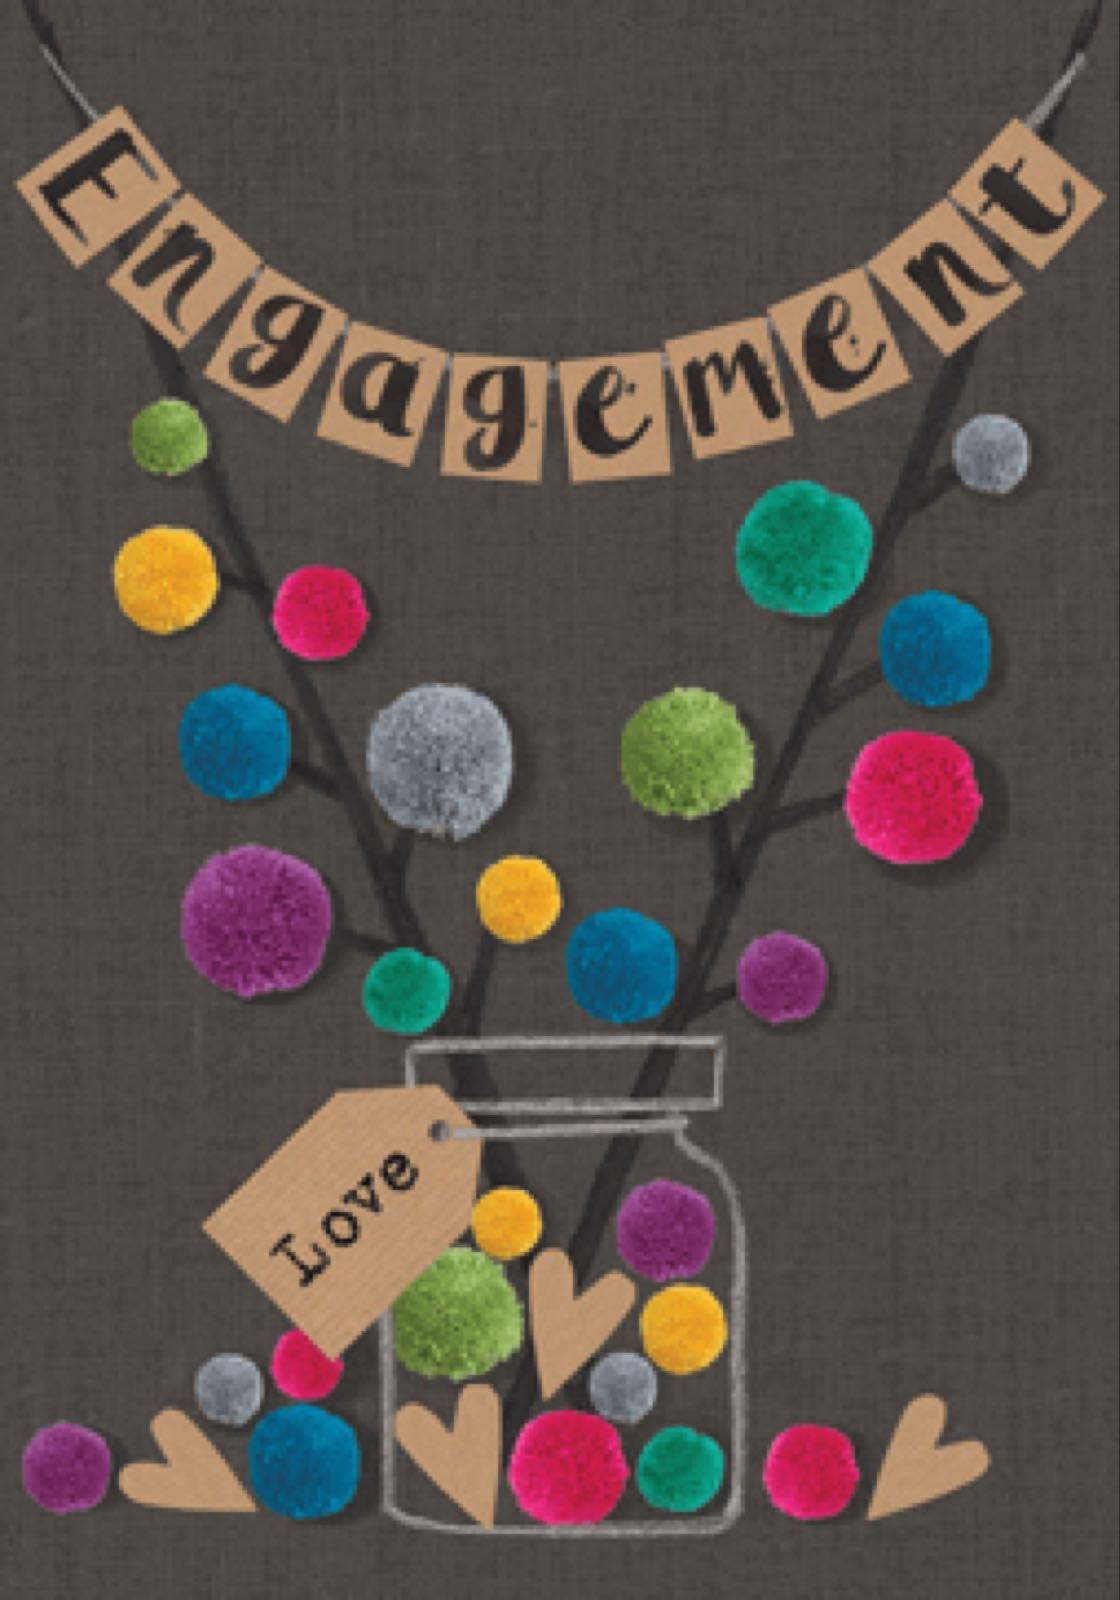 'Engagement' Sarah Kelleher Card